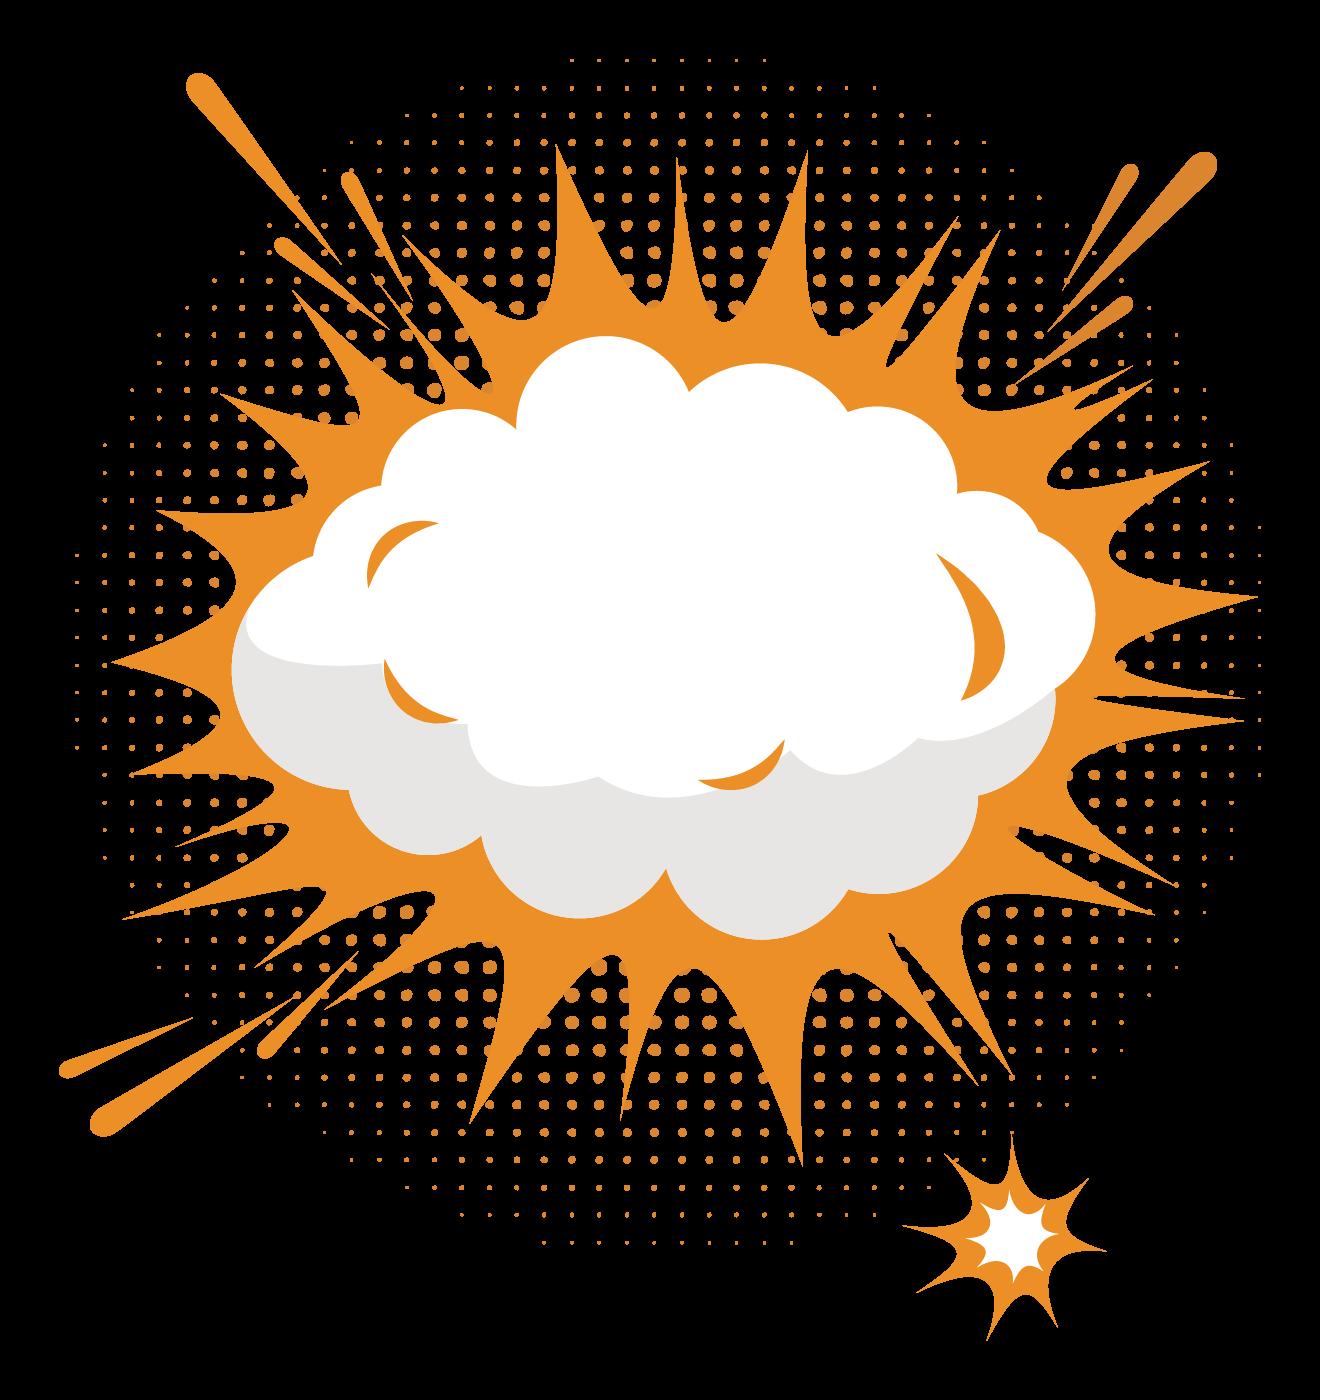 Cloud Png Clipart Cloud Png Transparent Free Download Cloud Vector Clouds Png